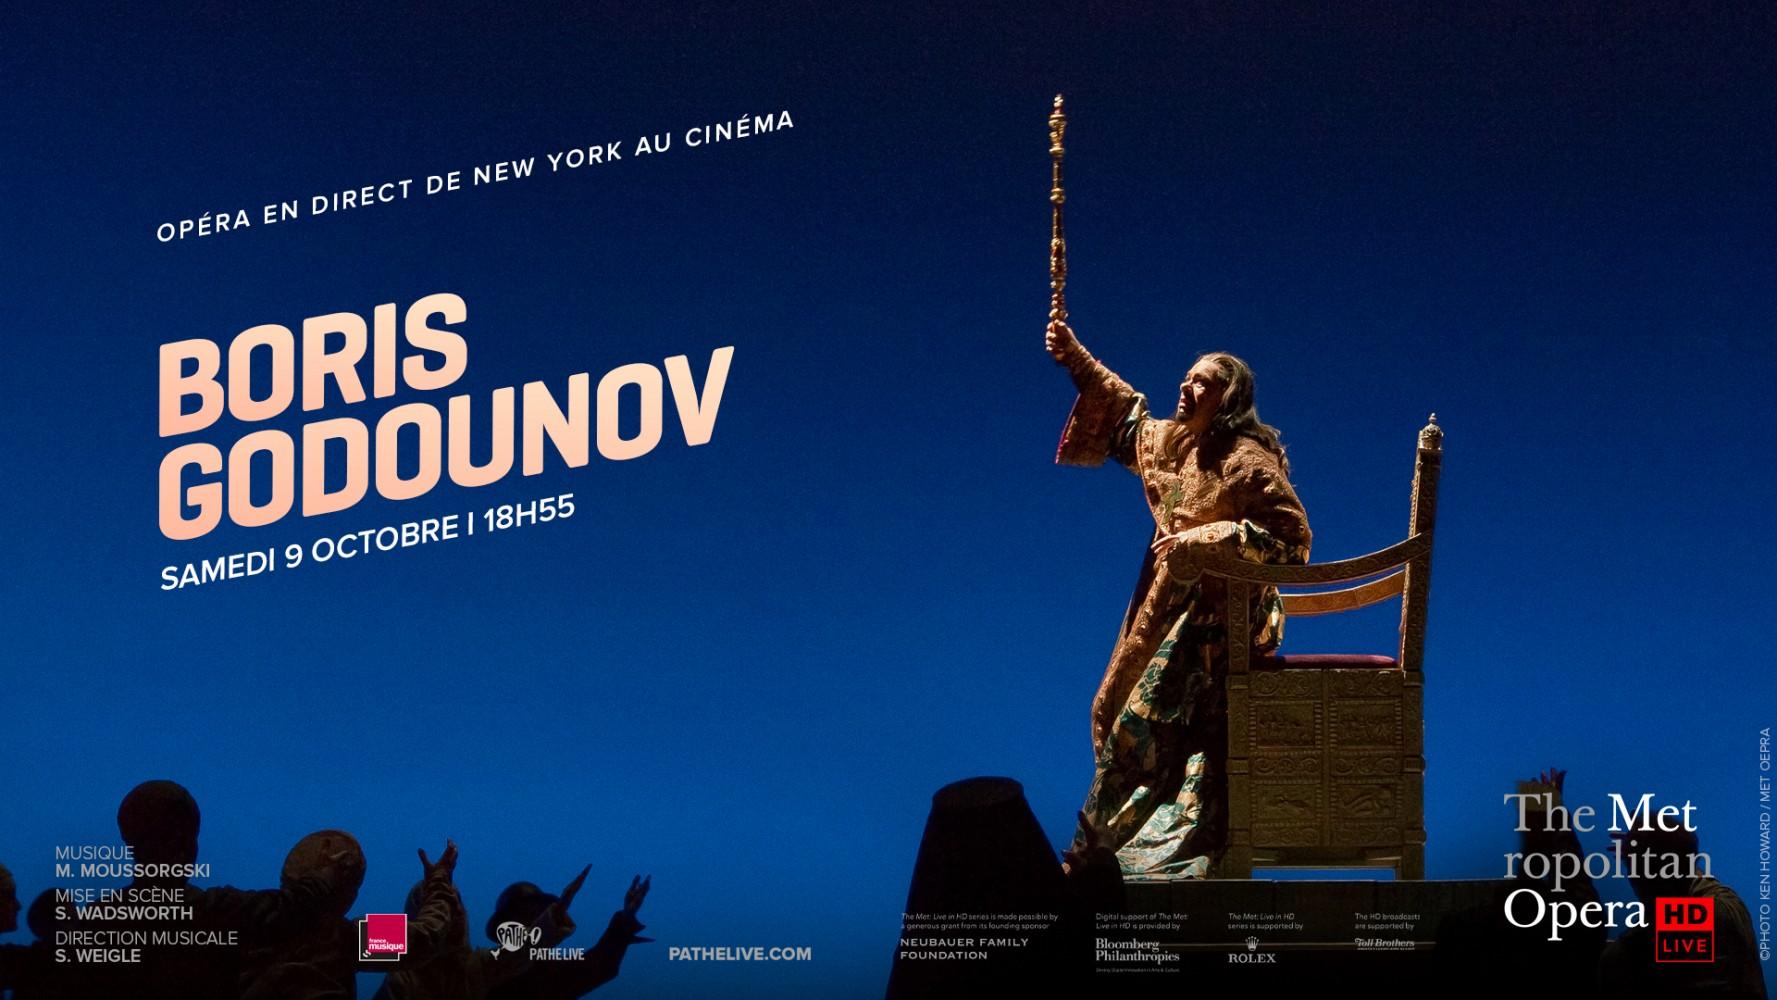 BORIS GODOUNOV - MET OPERA LIVE